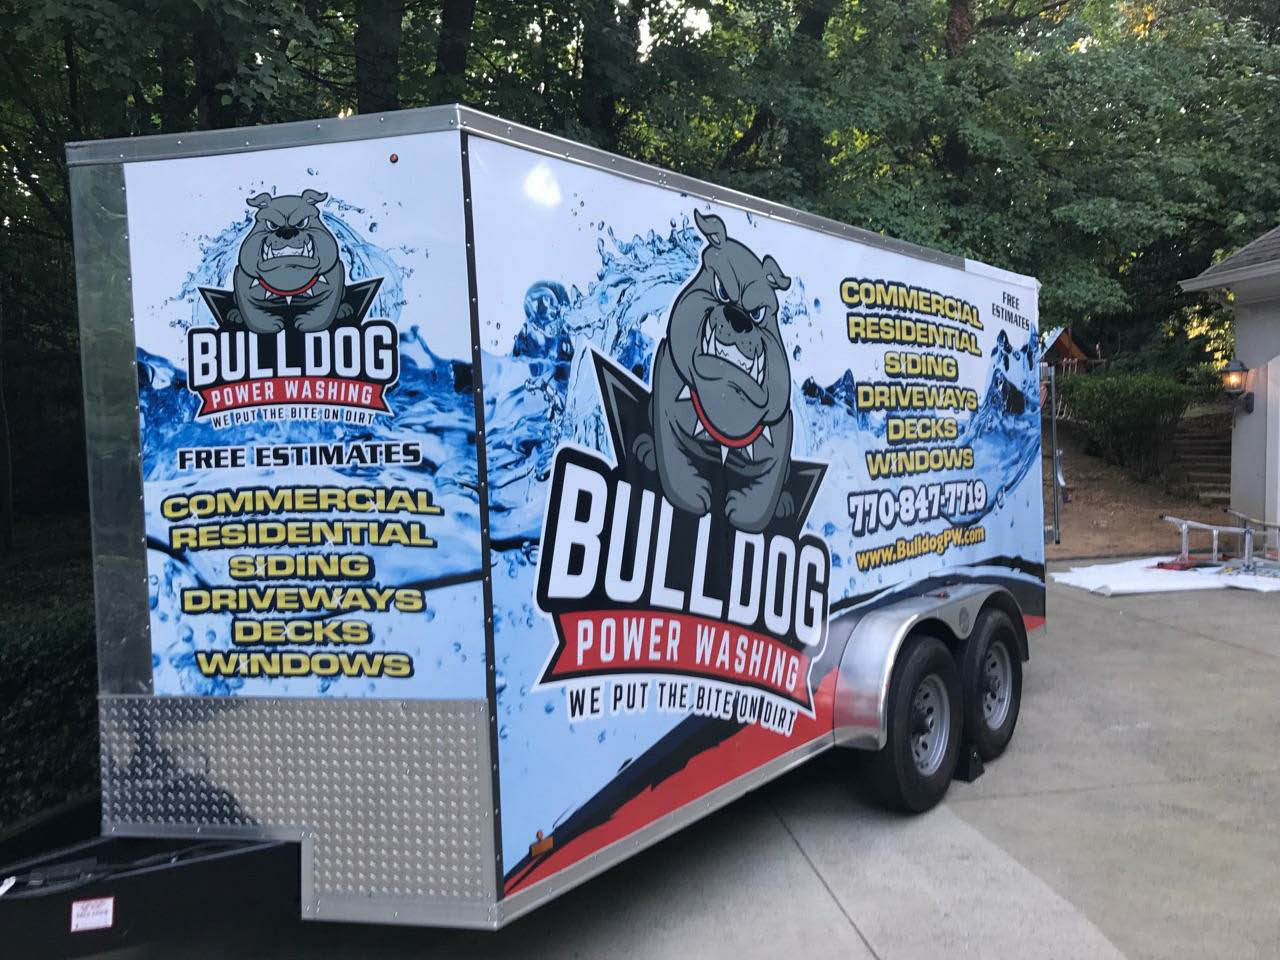 Bulldog Power Washing truck in your Atlanta neighborhood